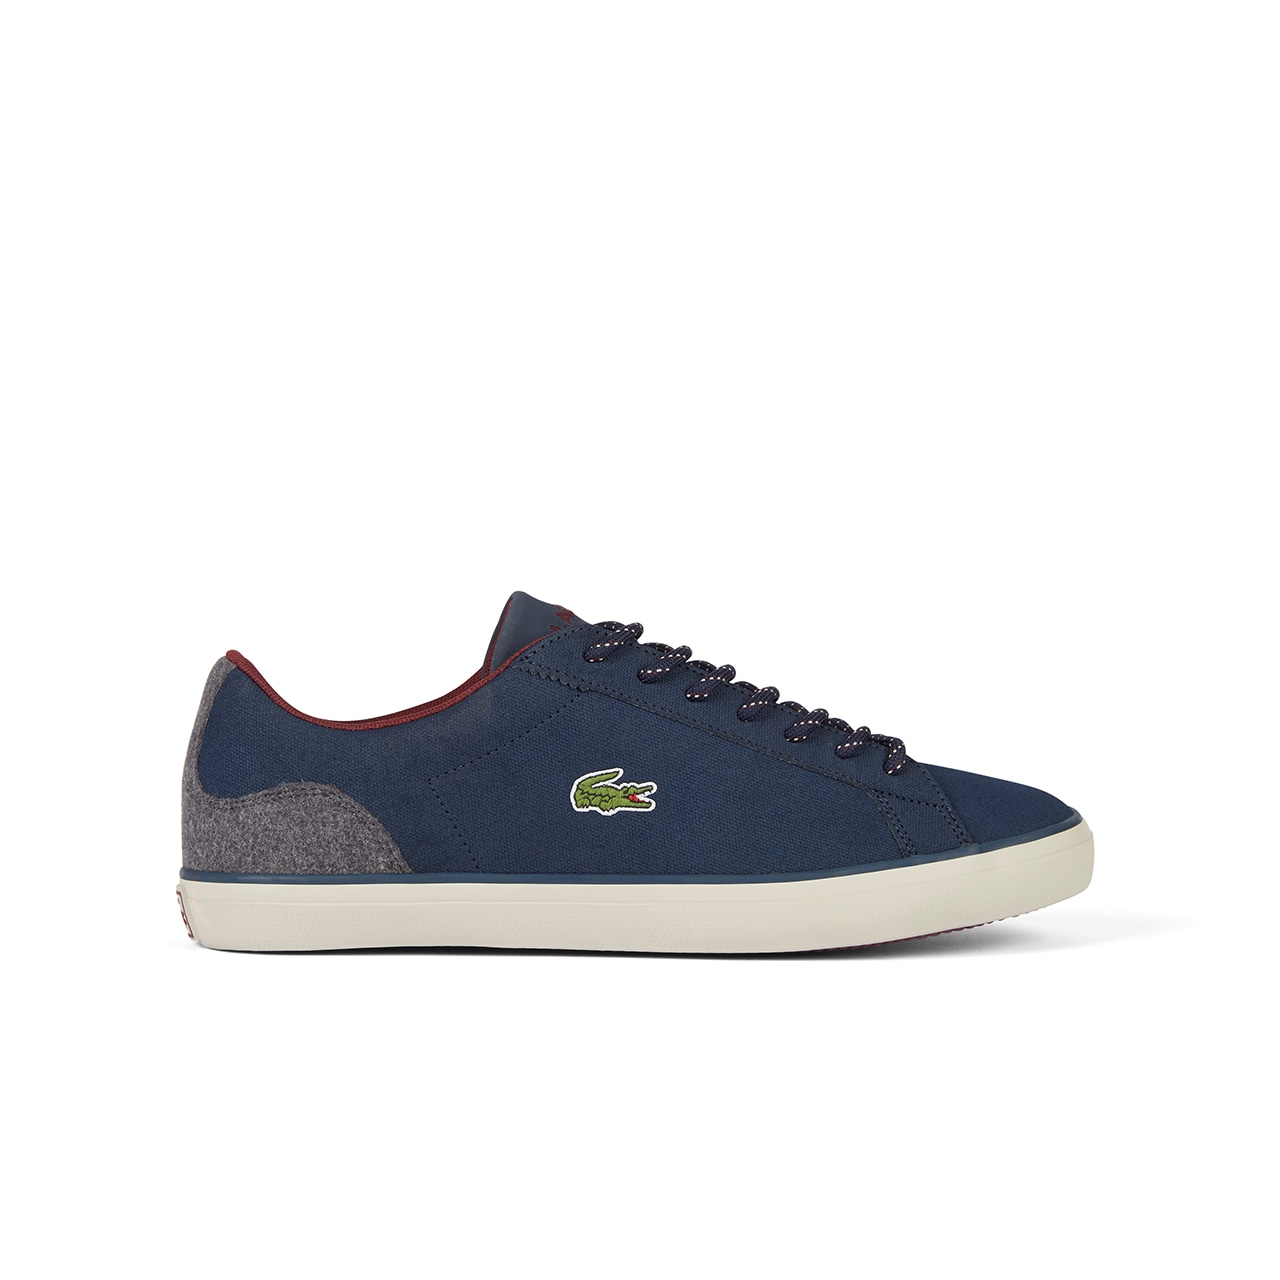 Men's Lerond Leather Sneakers